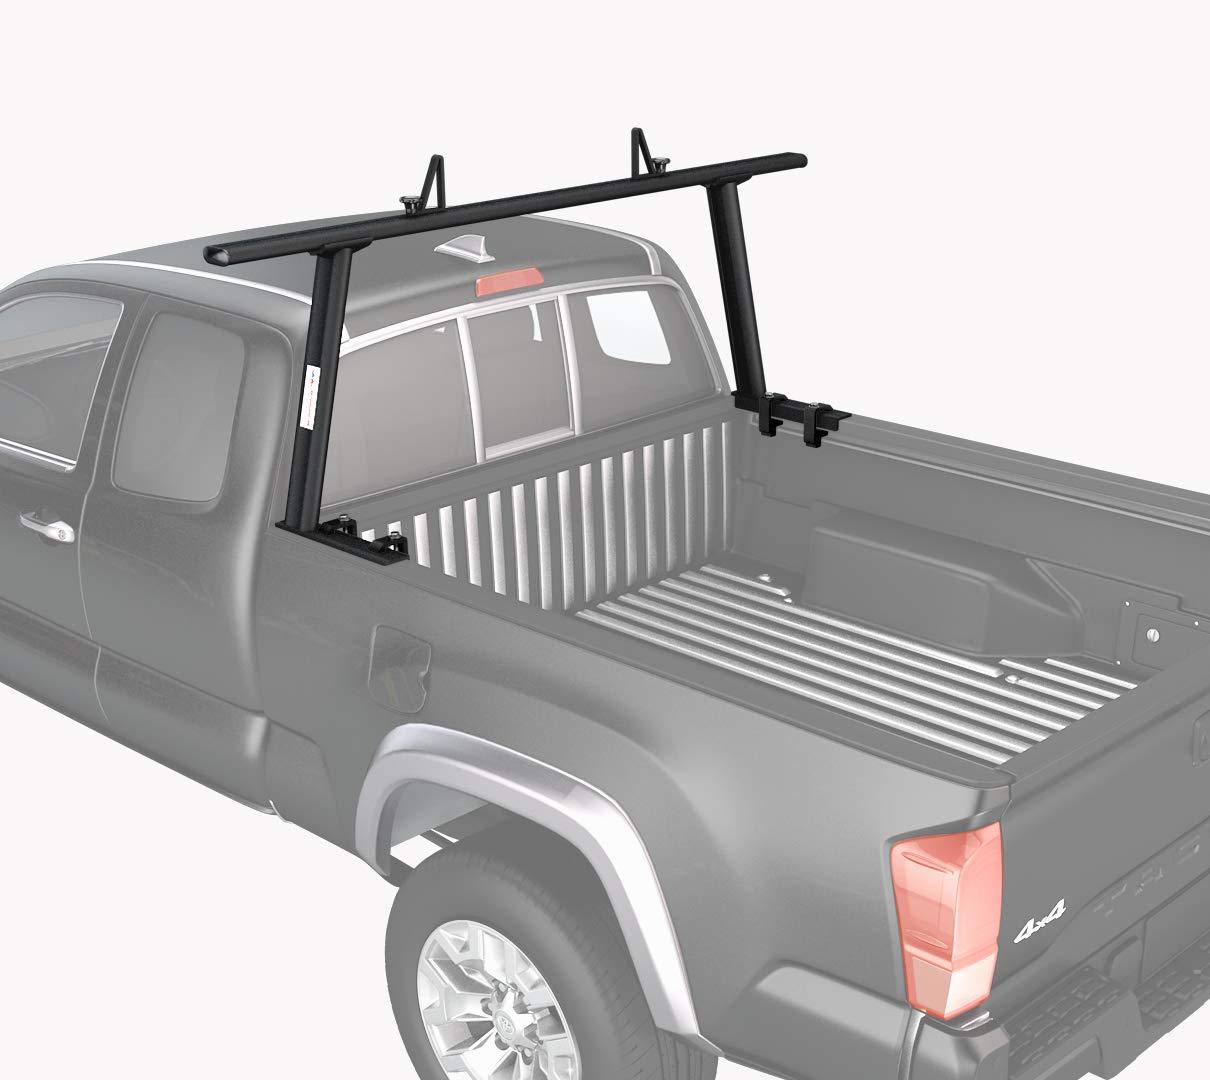 Sandy White AA-Racks APX25-A-WG-E Aluminum Headache Rack Semi Pickup Truck Rack w//Cantilever Extension Back Rack